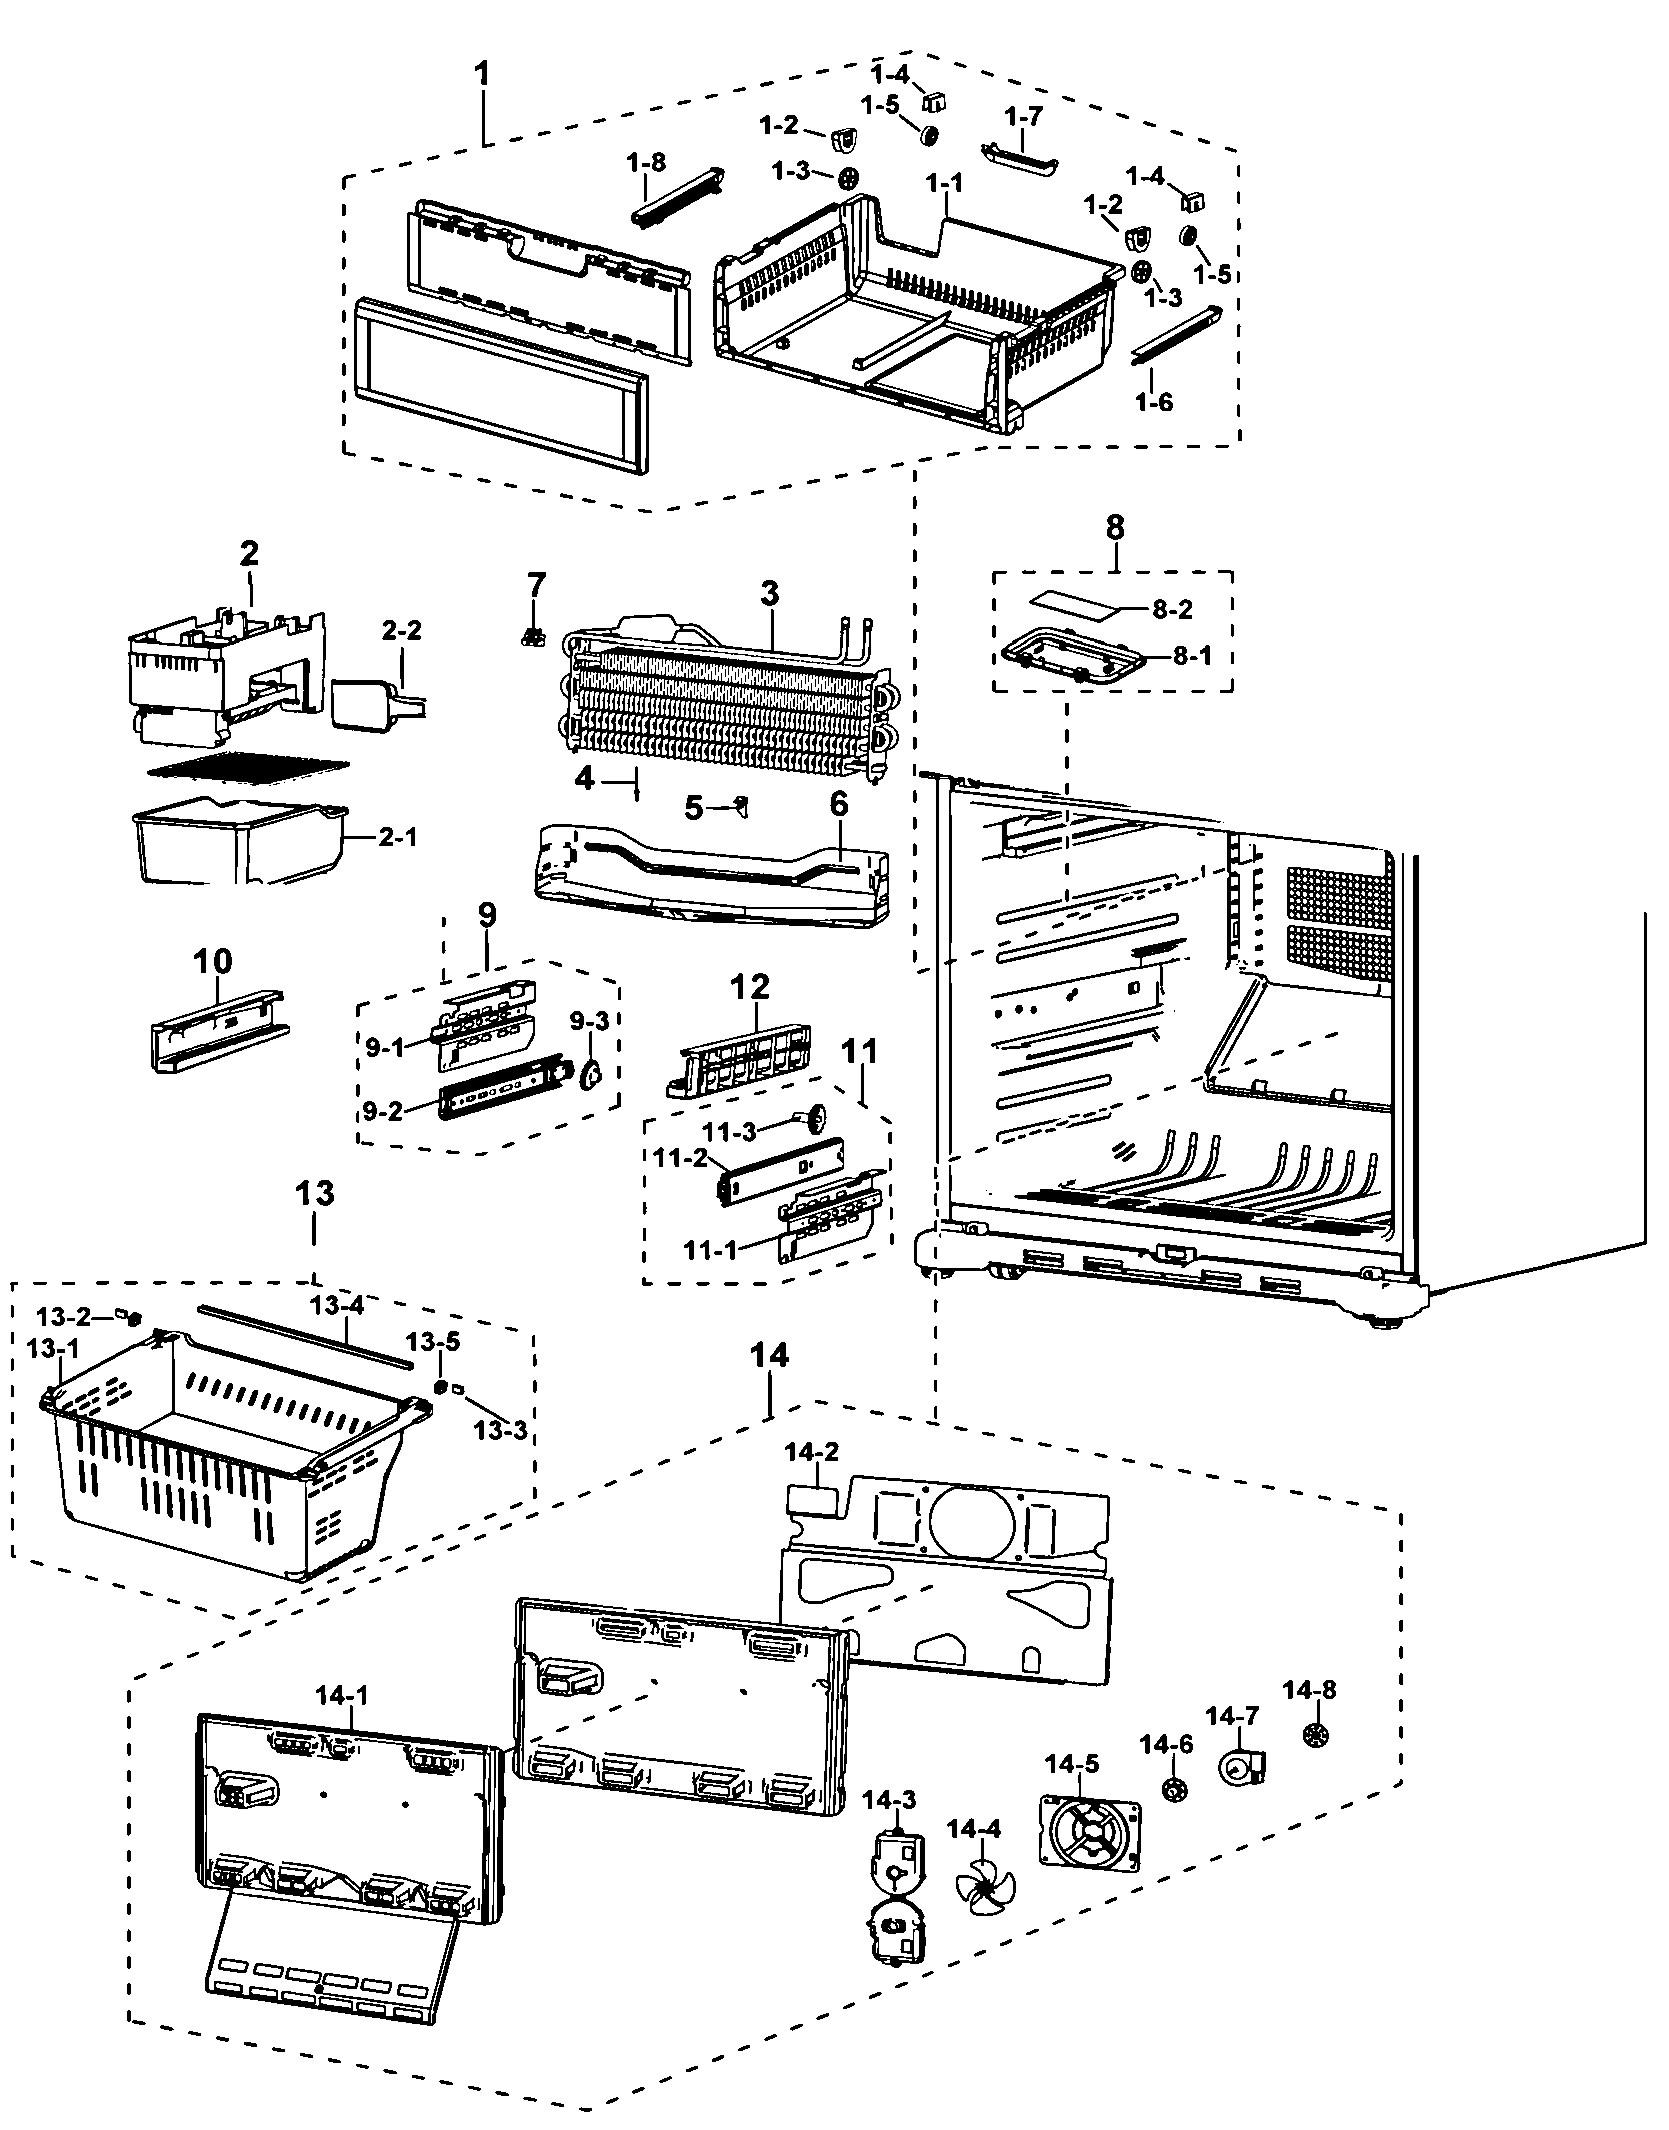 Mbe 4000 Engine Diagram 6 Pin Wiring Diagrams Briggs Another Blog About Wiring Diagram • Of Mbe 4000 Engine Diagram